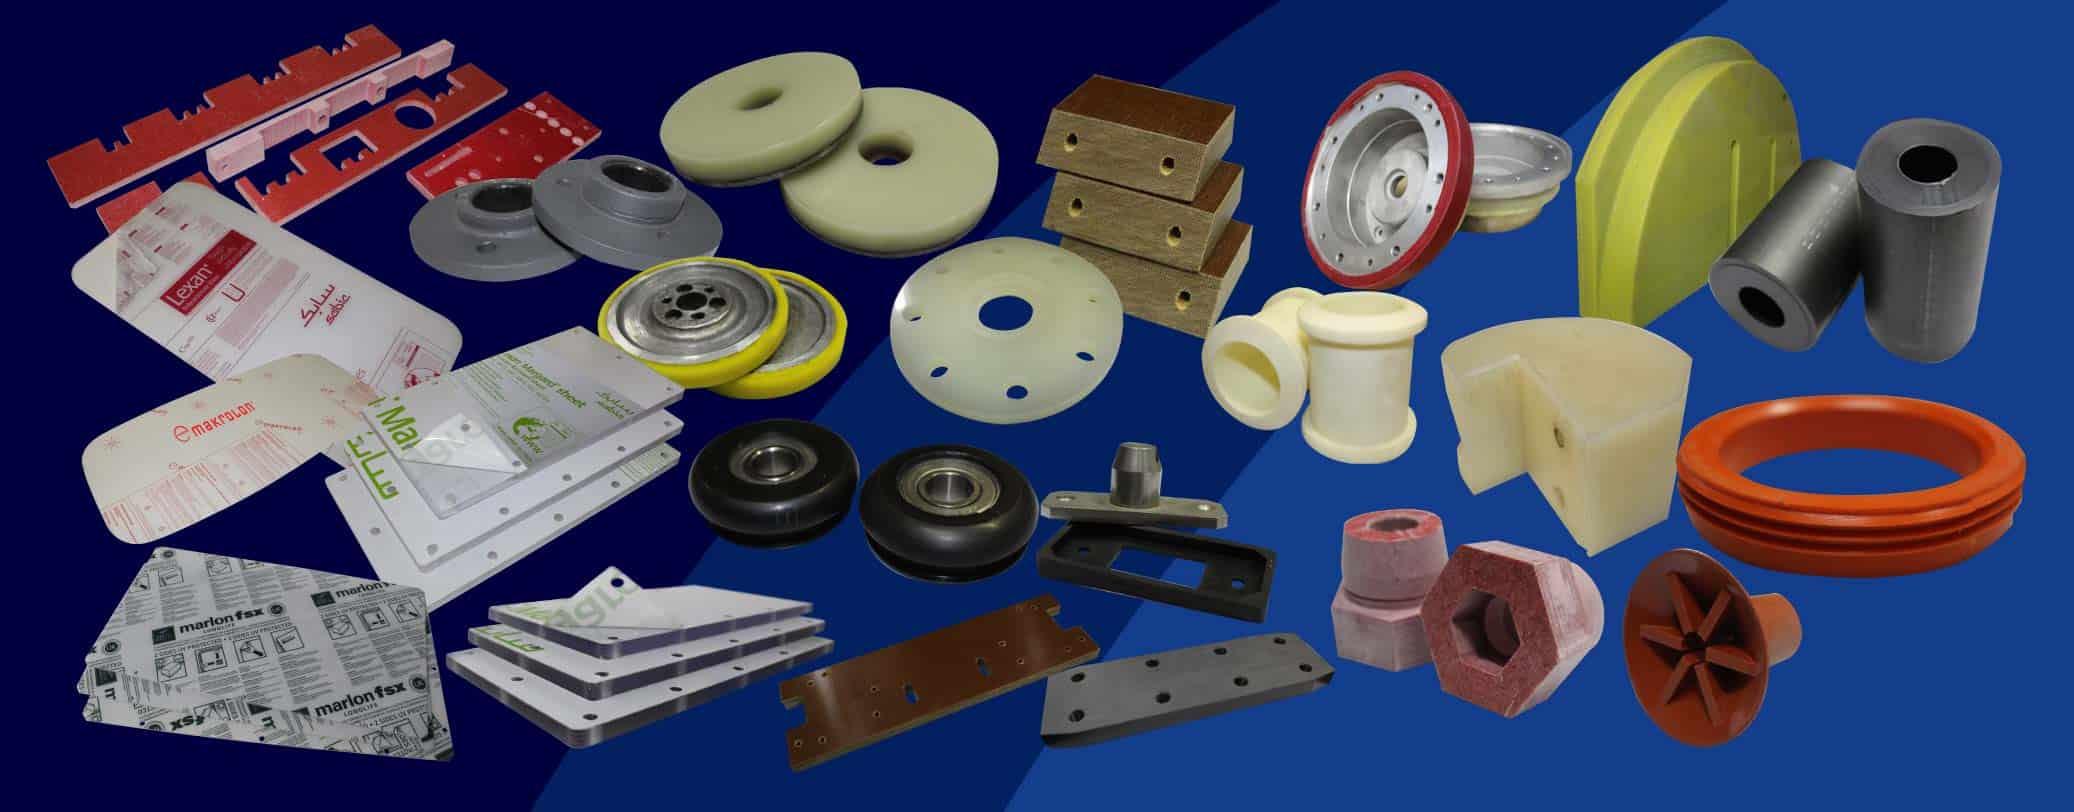 EGA Plastics Engineering Assortment